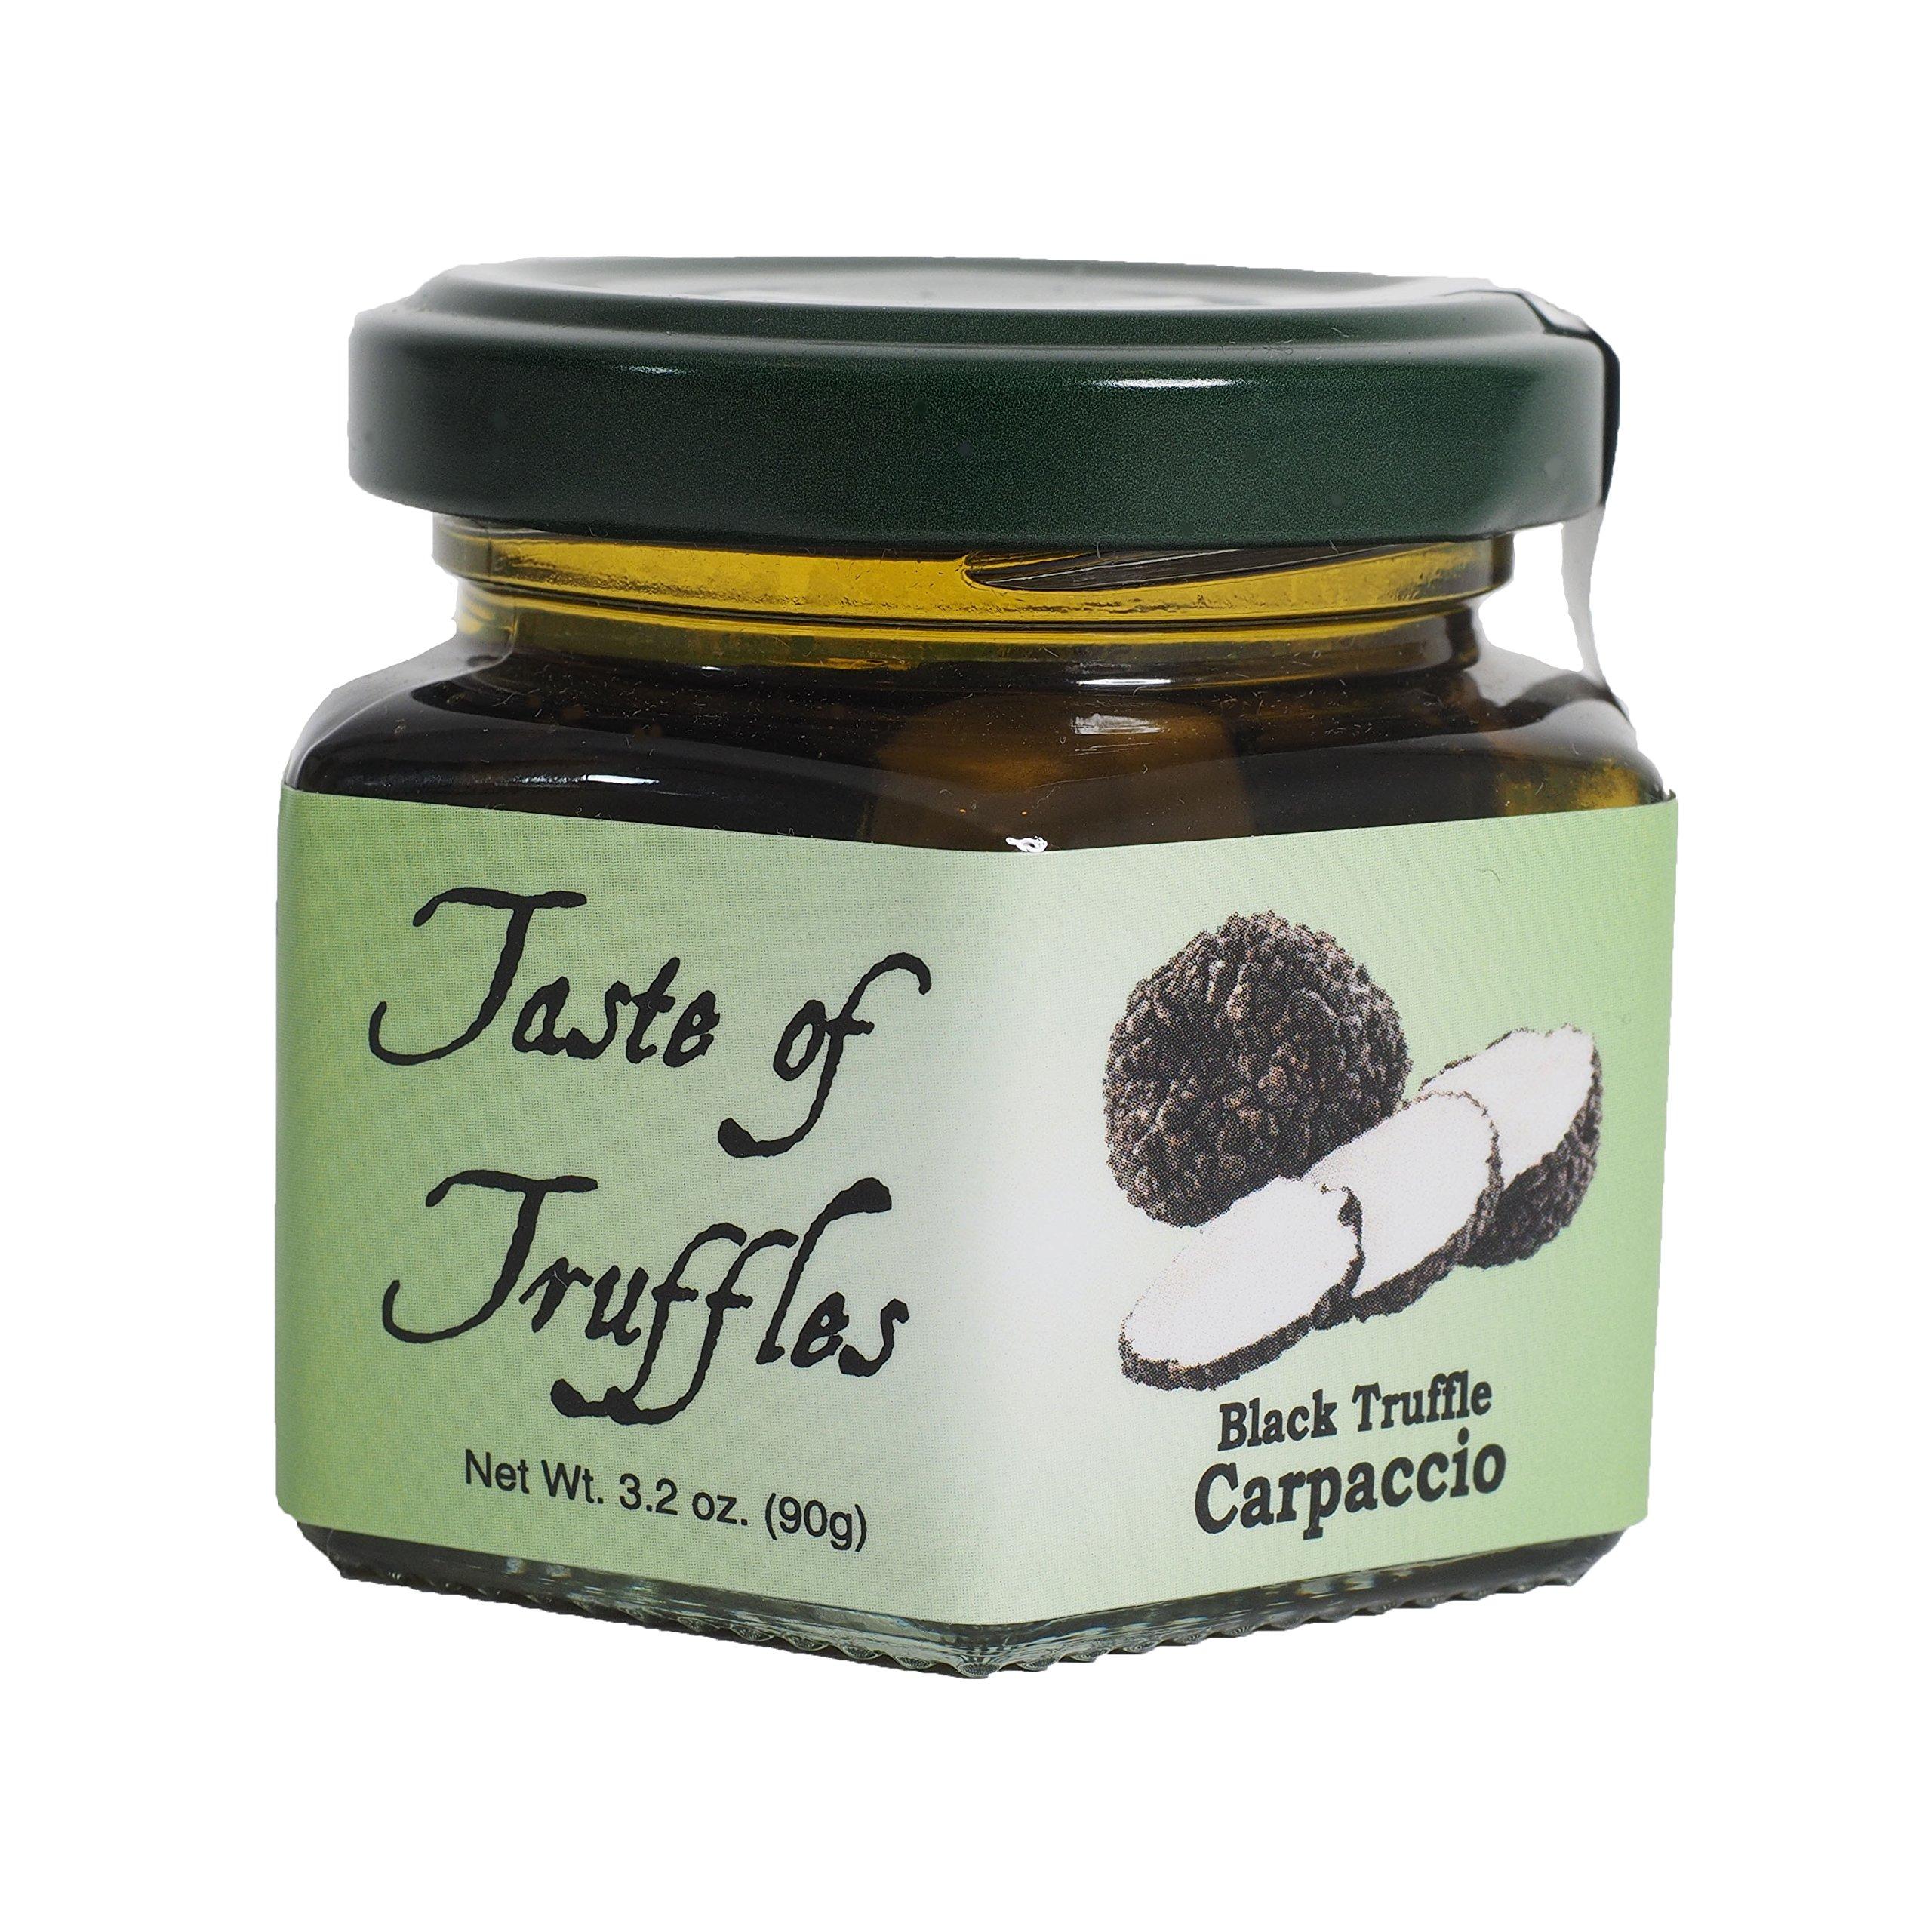 Black Truffle Carpaccio | Sliced Truffles | wt.3.2 oz